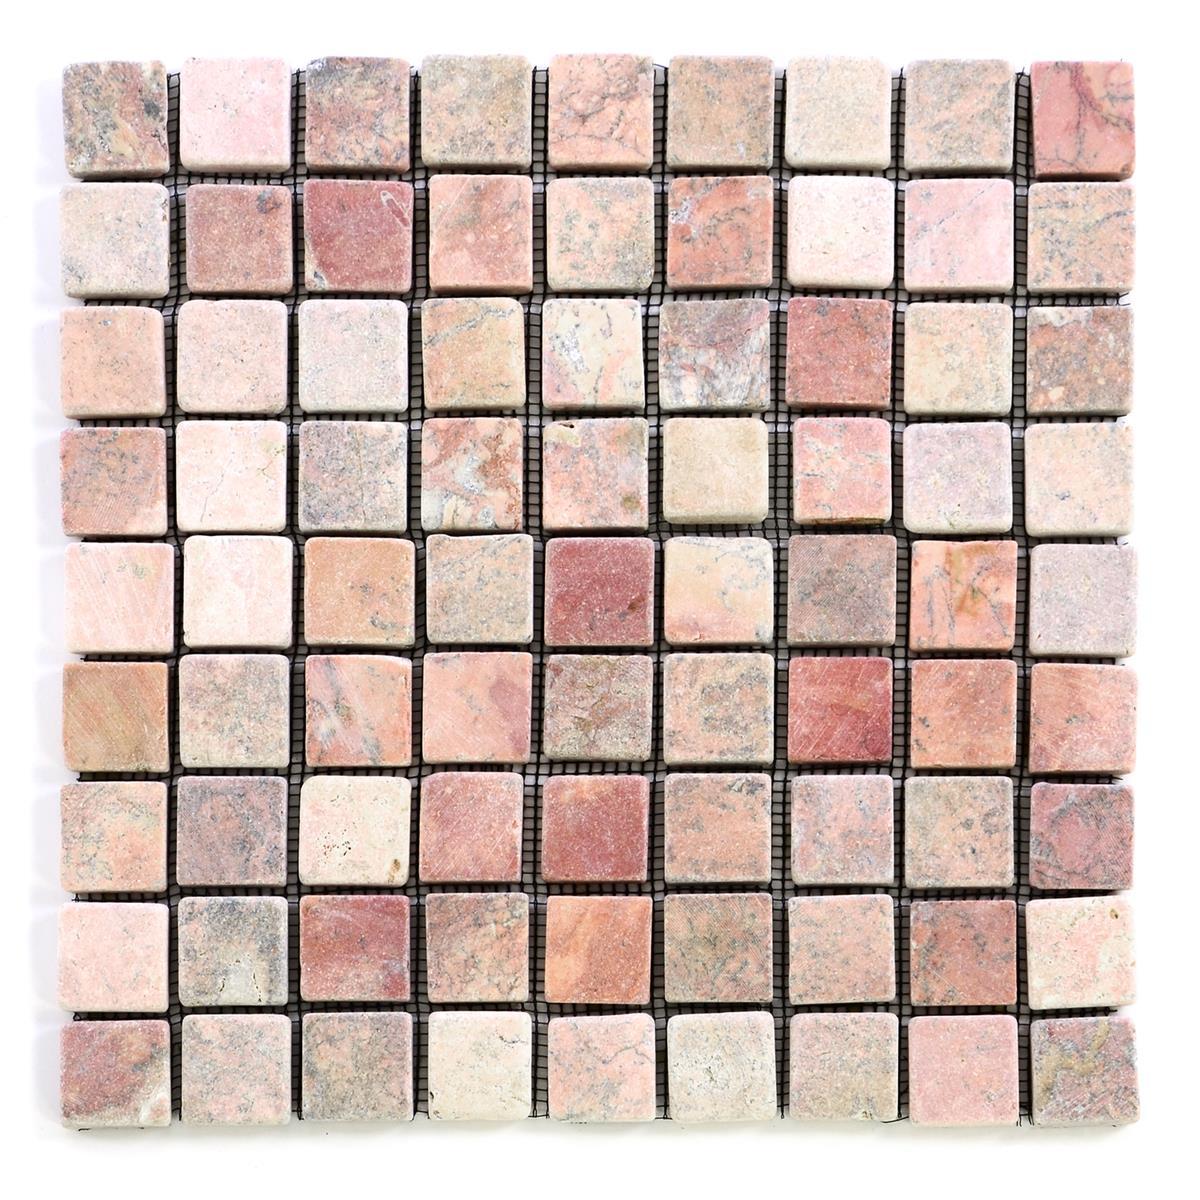 DIVERO 1 Fliesenmatte Naturstein Mosaik aus Marmor creme/rosa  29 x 29 cm